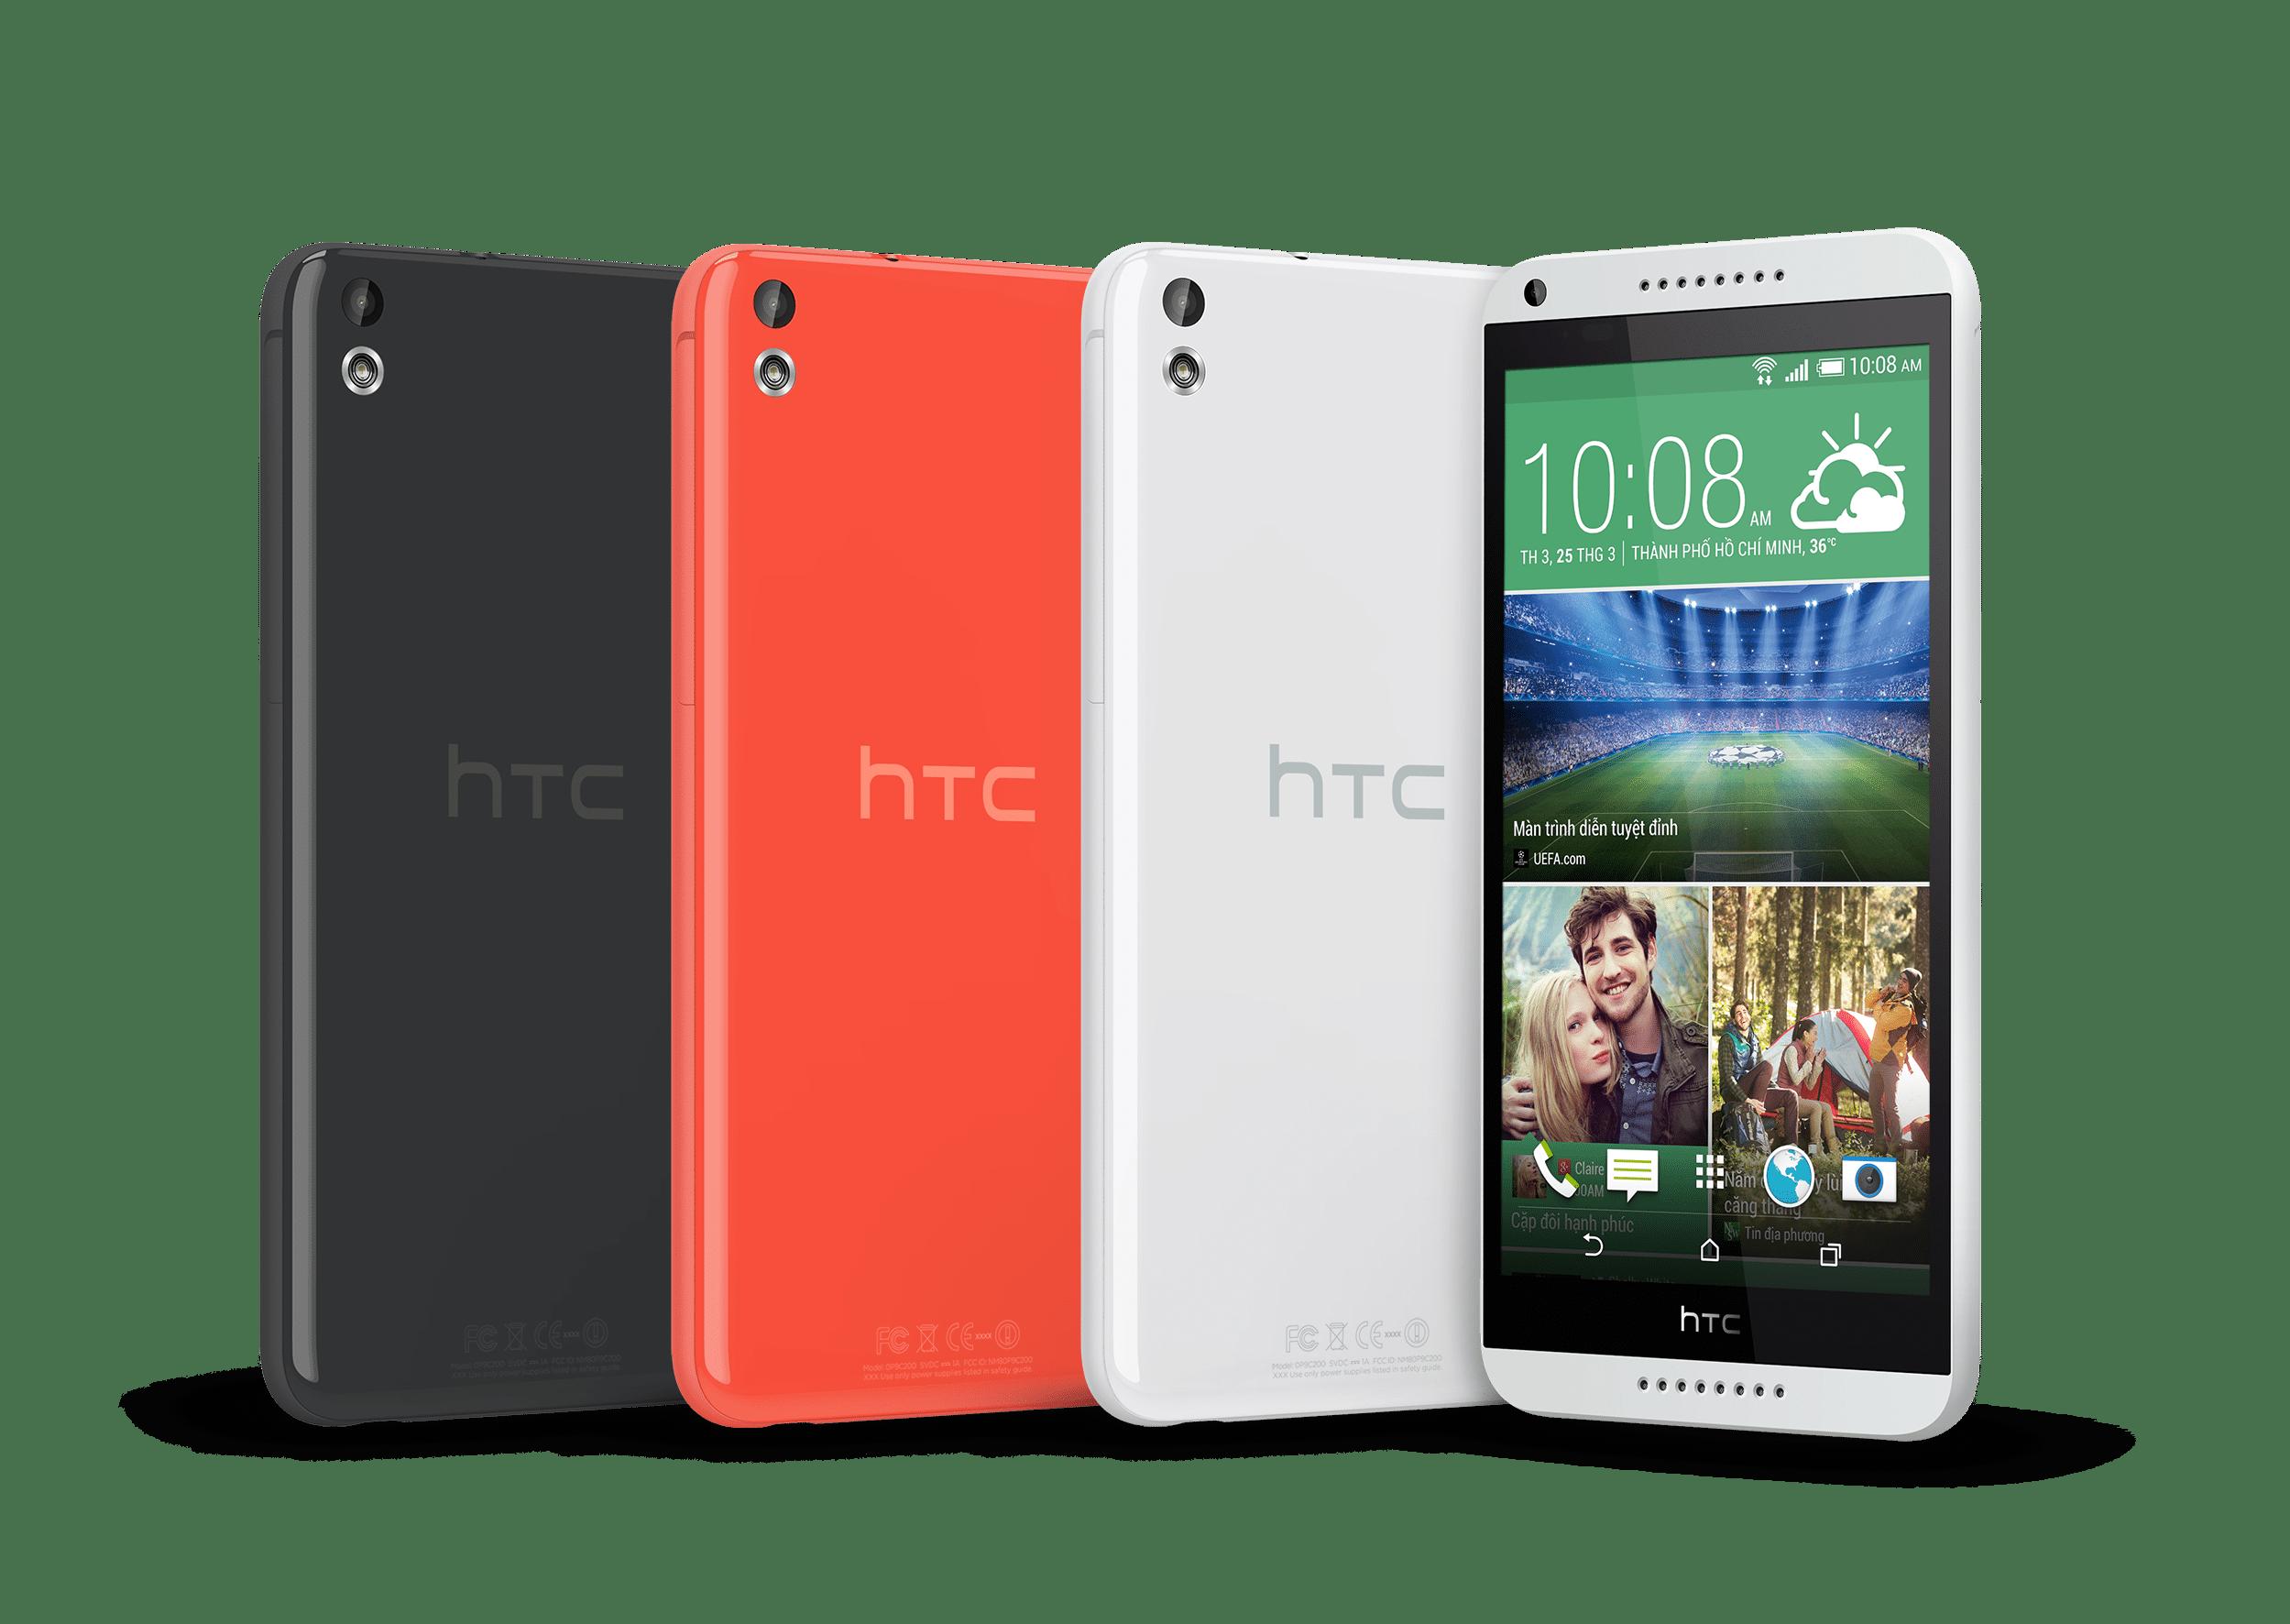 HTC Desire 8161 - HTC One M8, Desire 816 giảm giá nhẹ